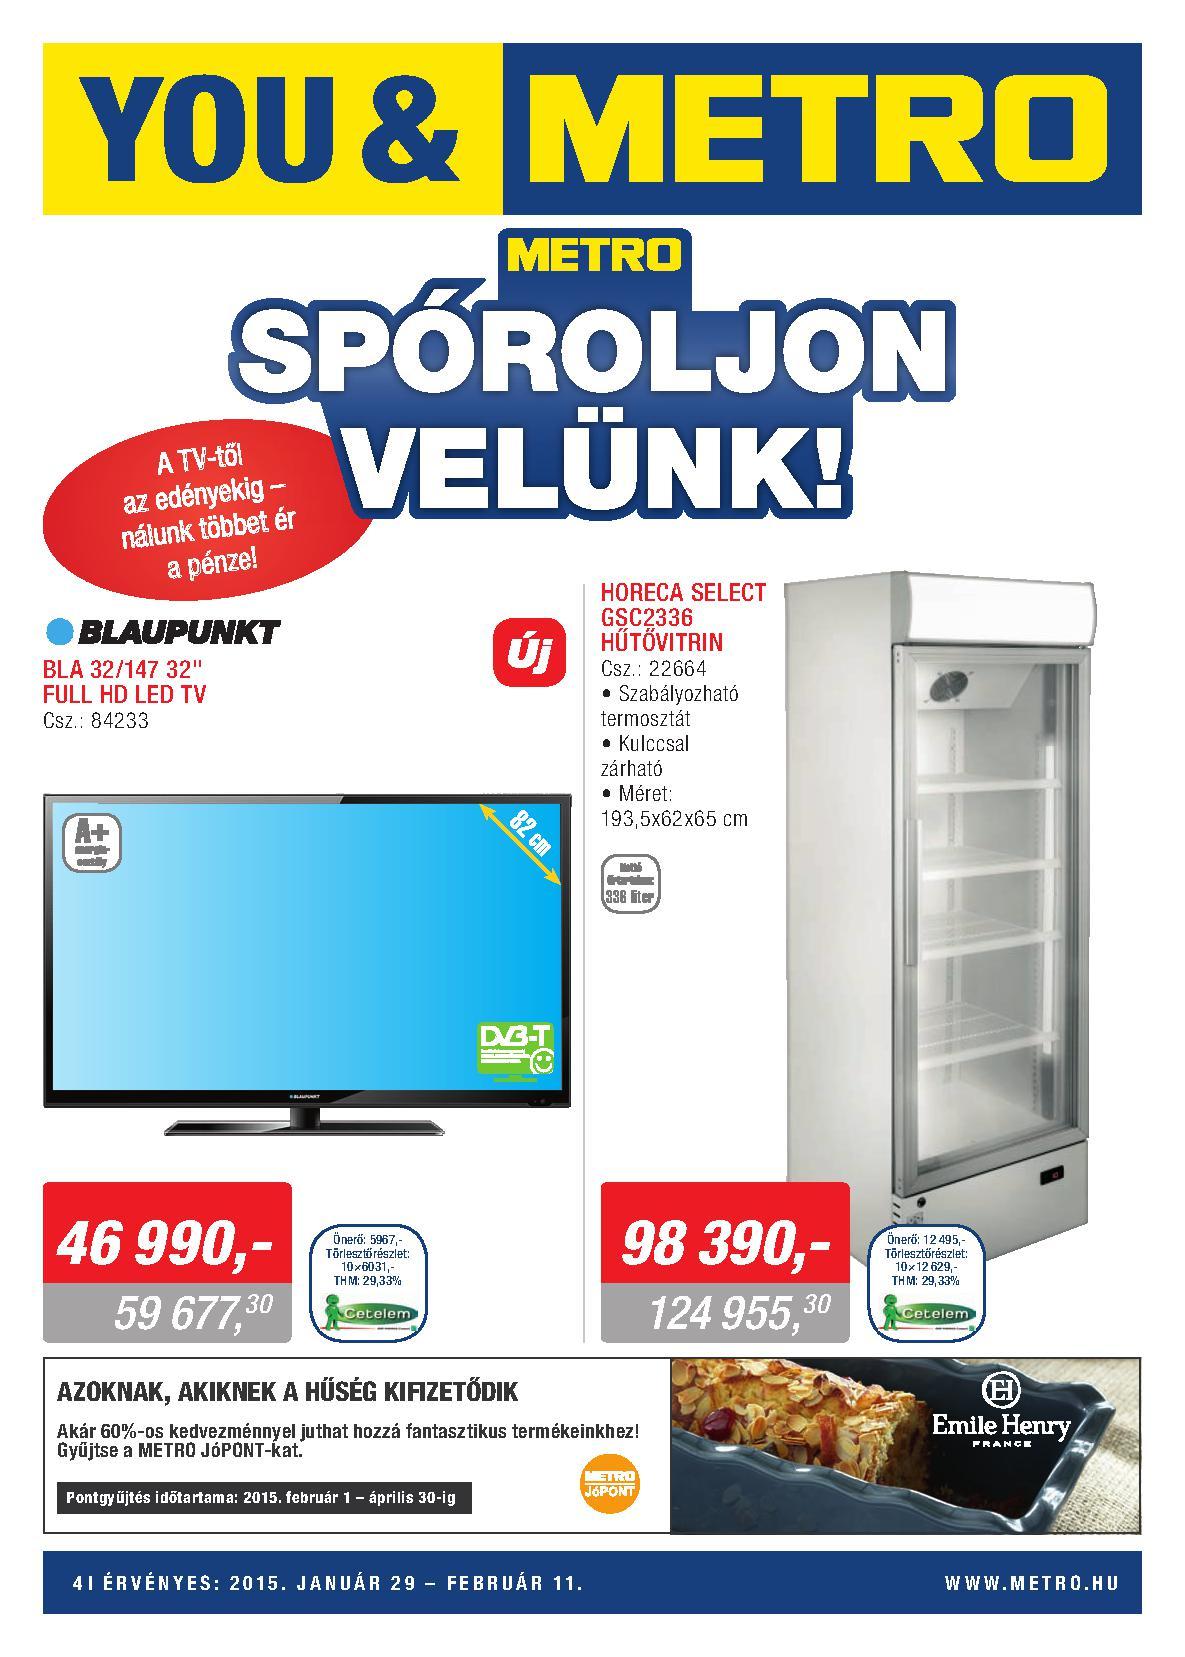 Metro Mađarska sezonska ponuda